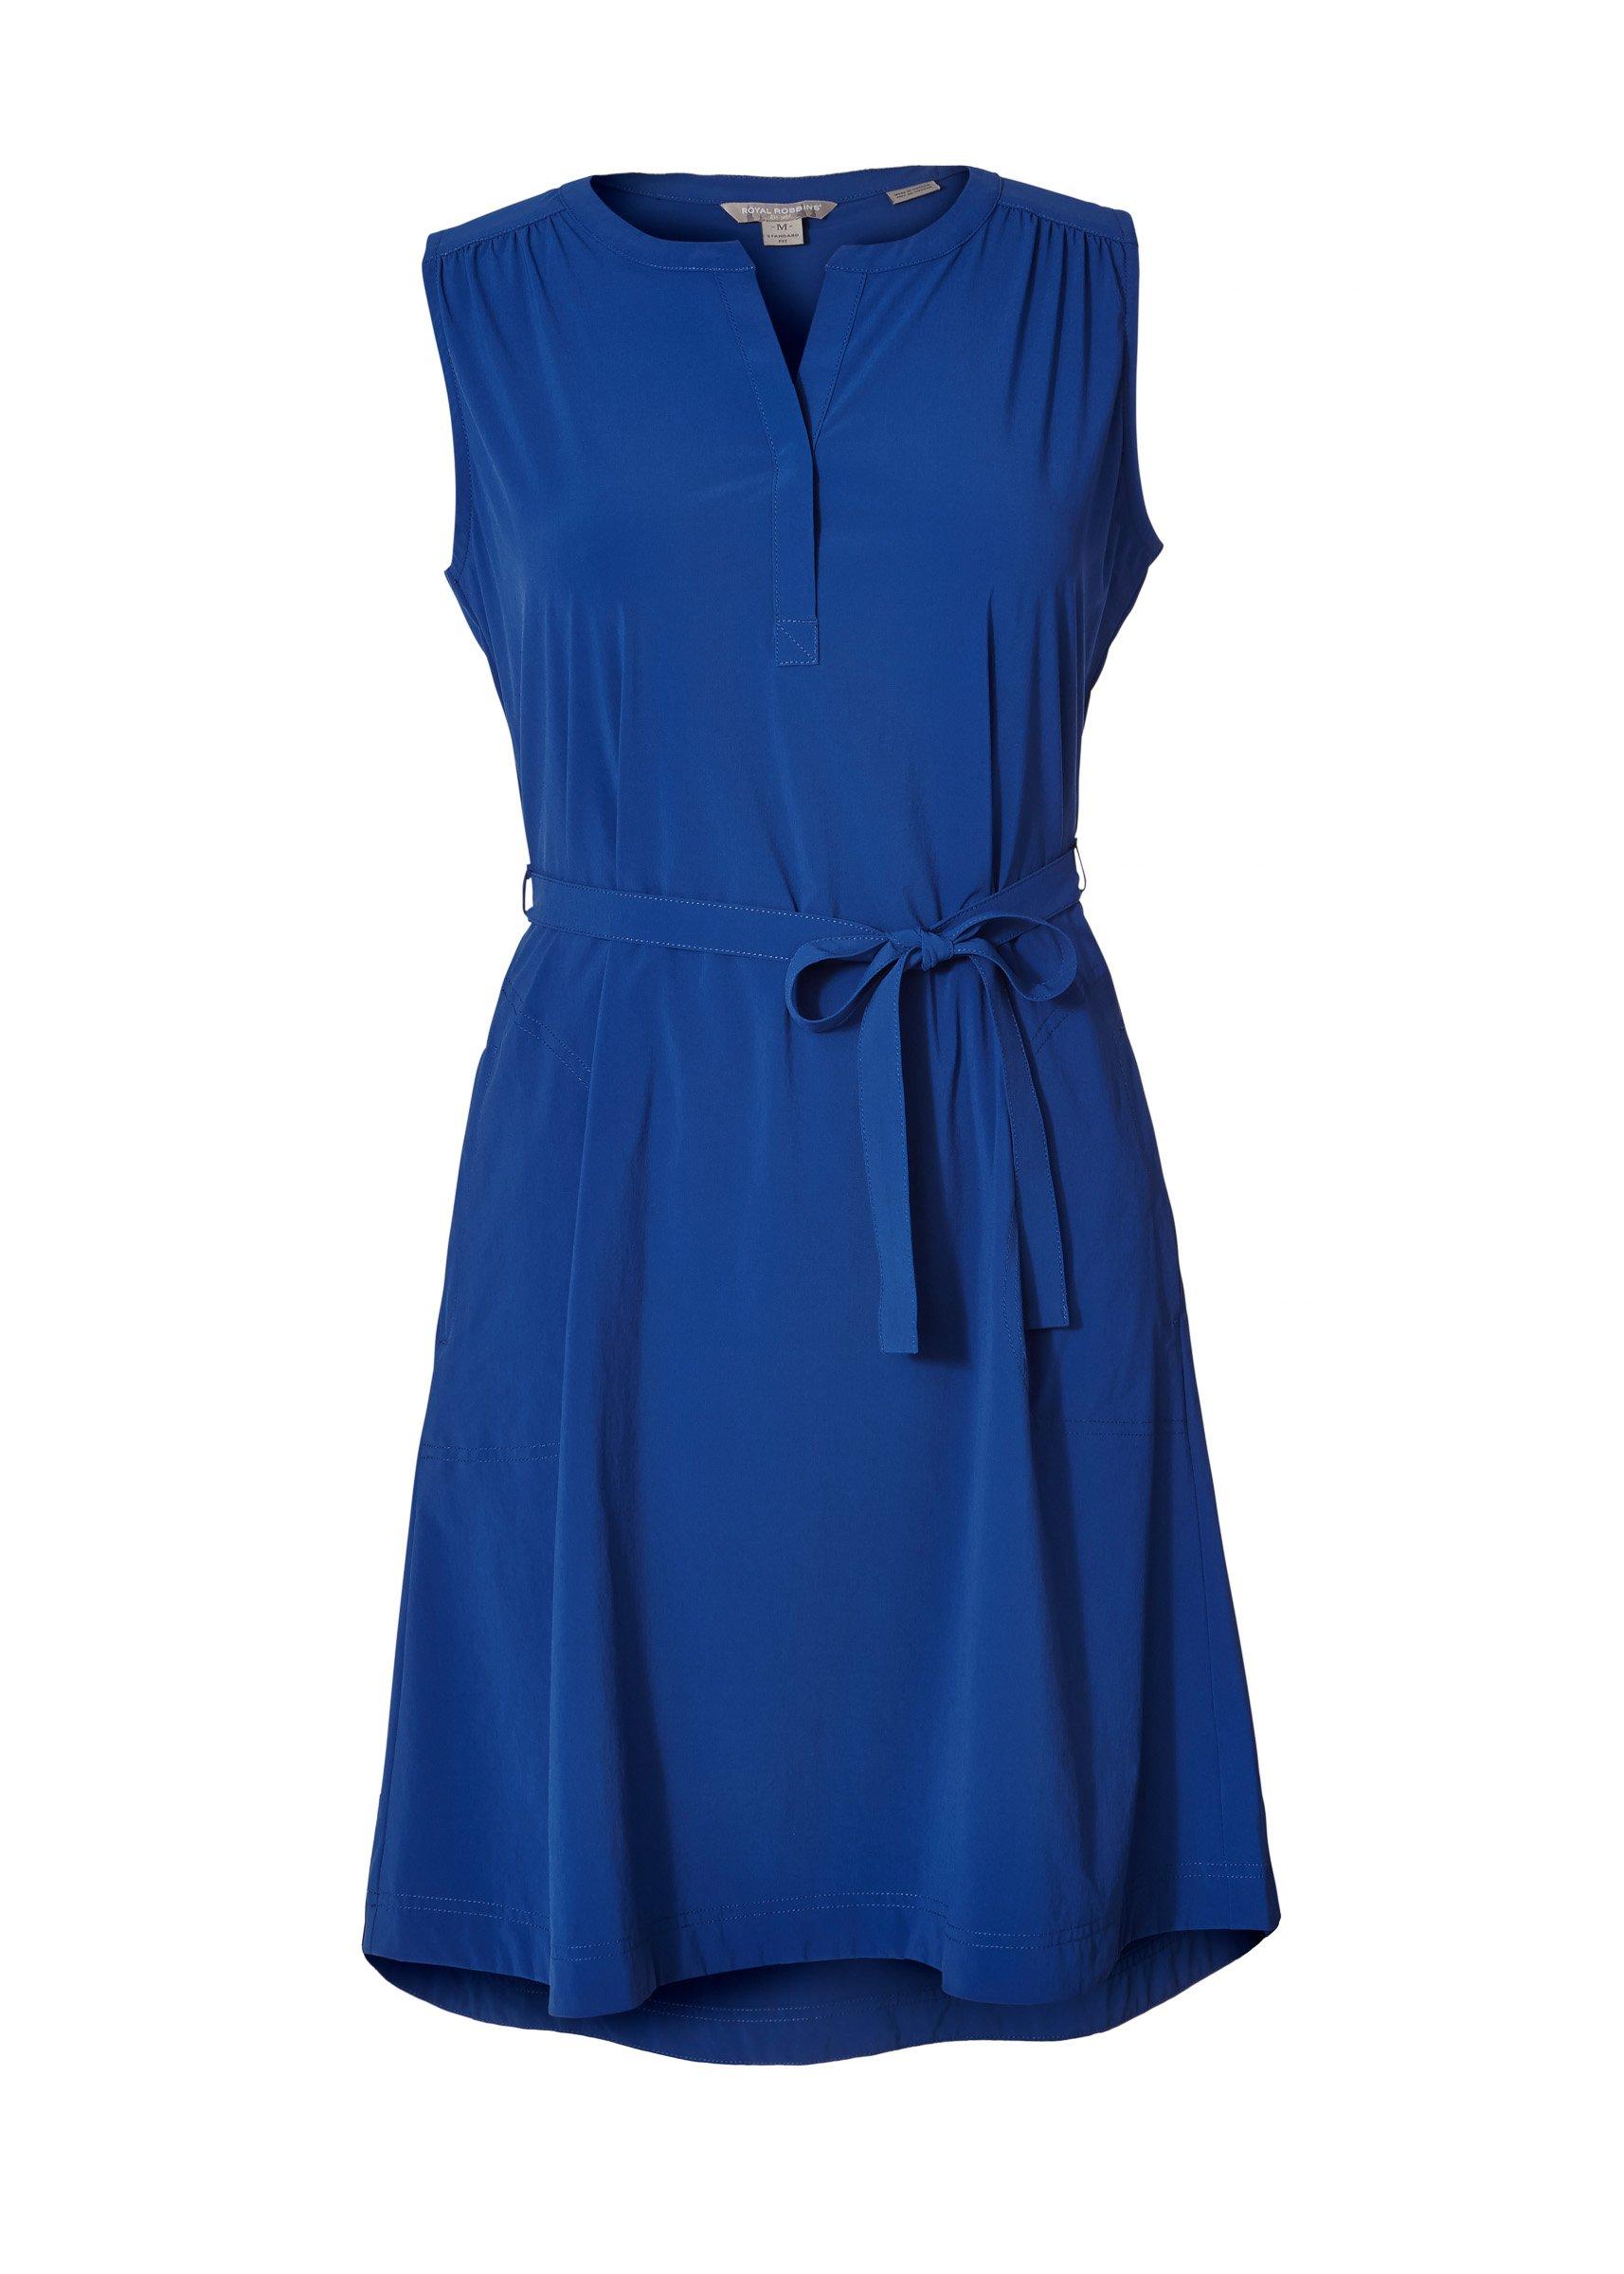 Royal Robbins Women's Spotless Traveler Tank Dress, Abyss, Size 10